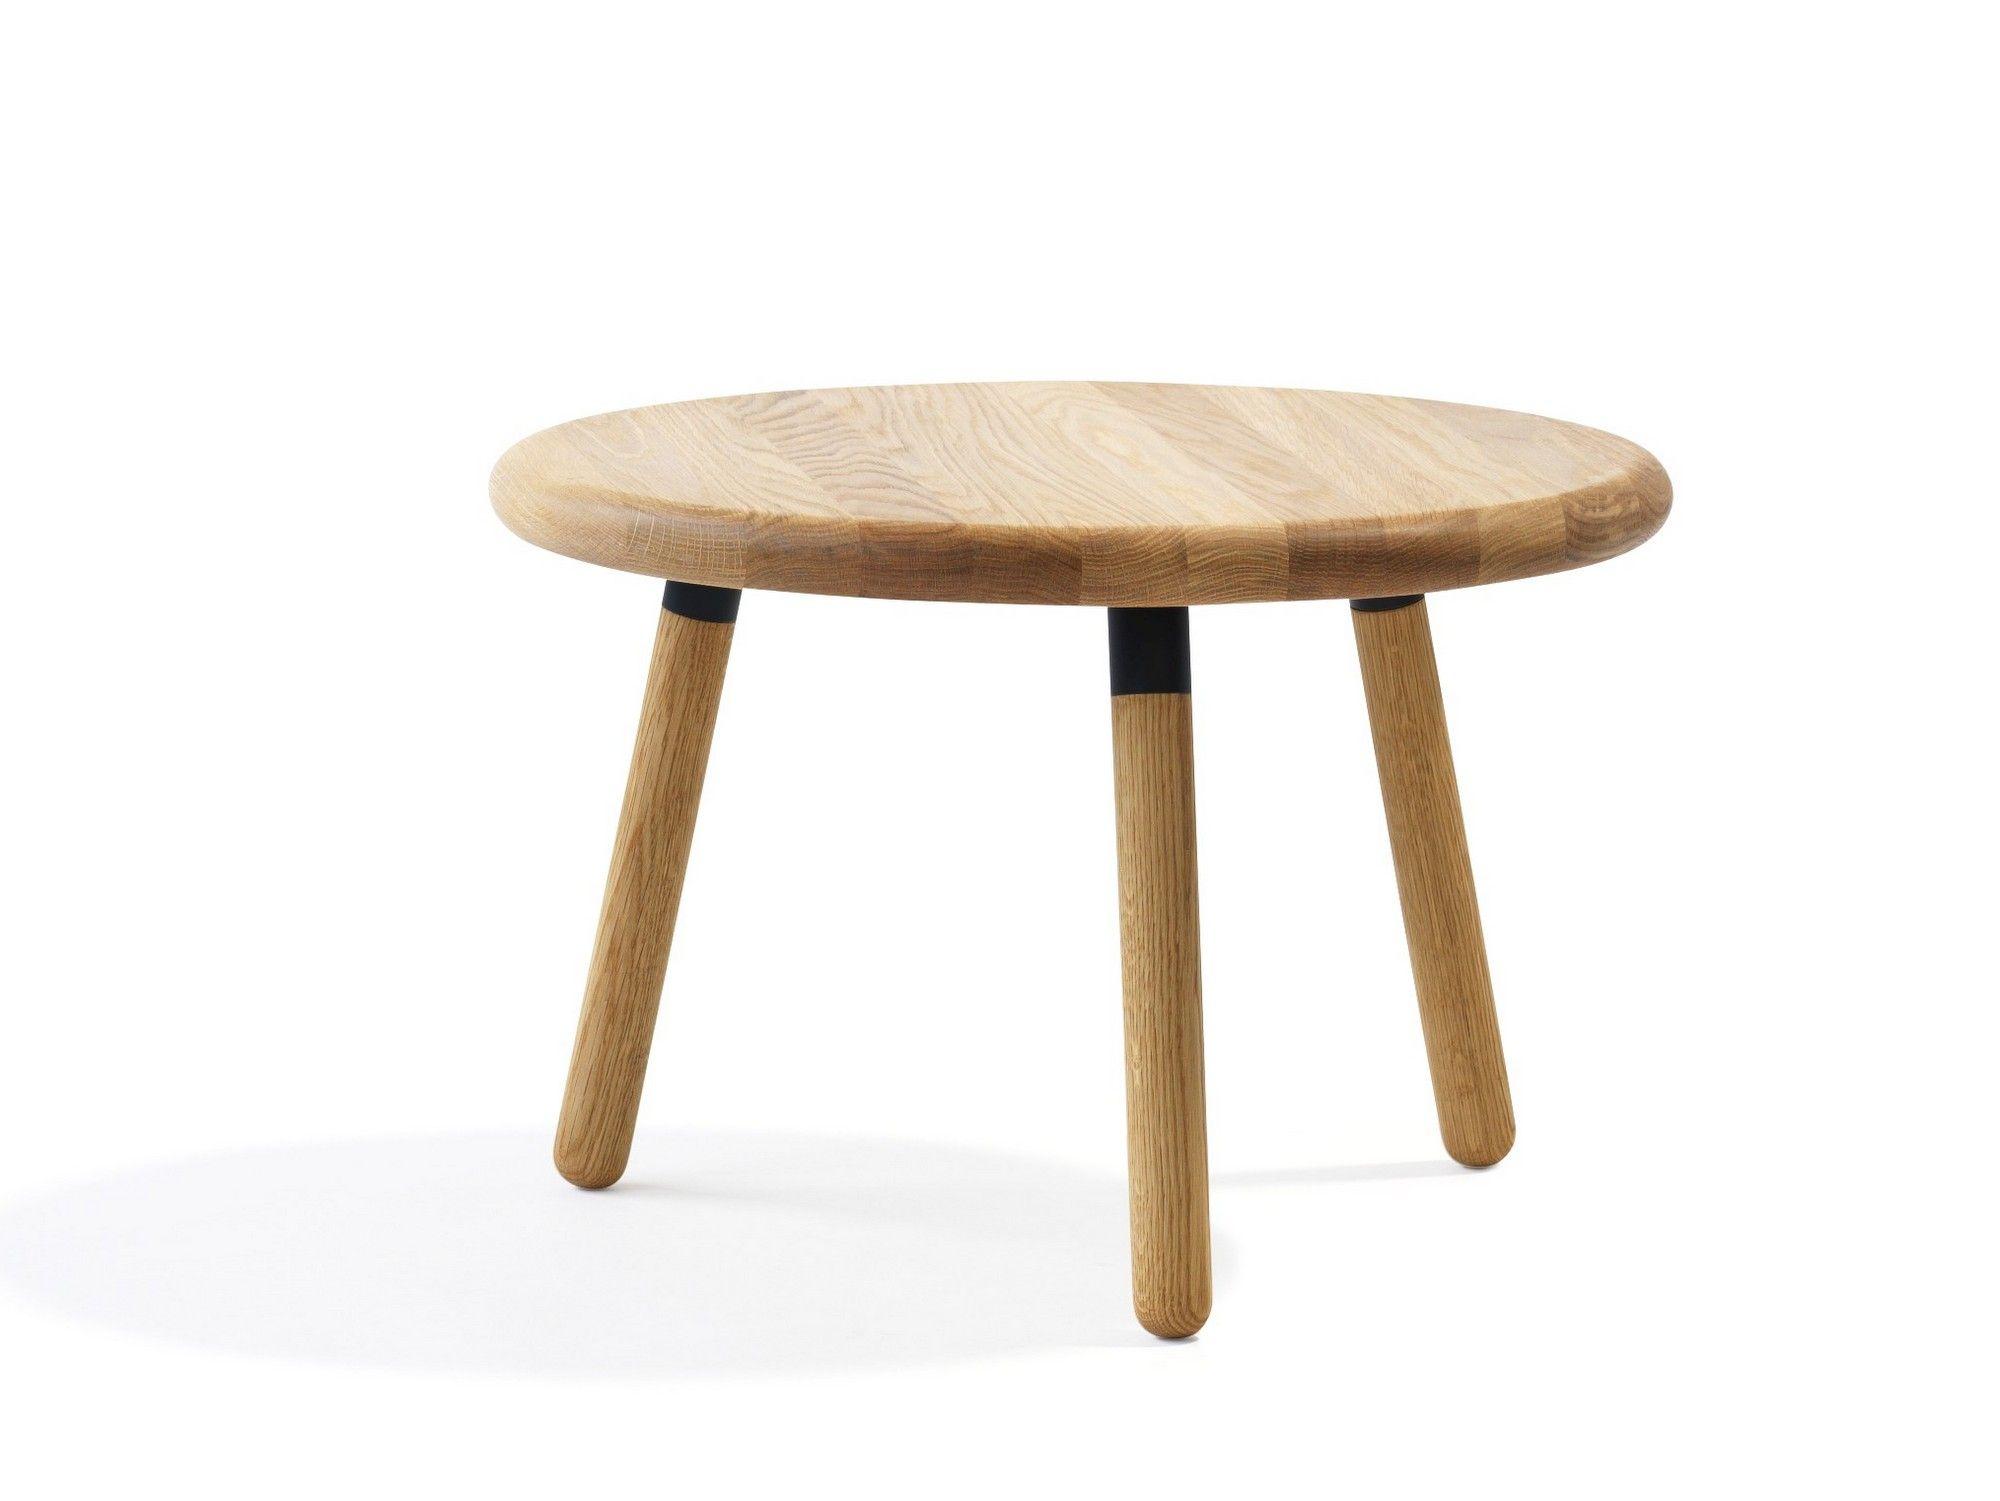 HONKEN Coffee table by Blå Station design Stefan Borselius, Thomas Bernstrand, Johan Lindau